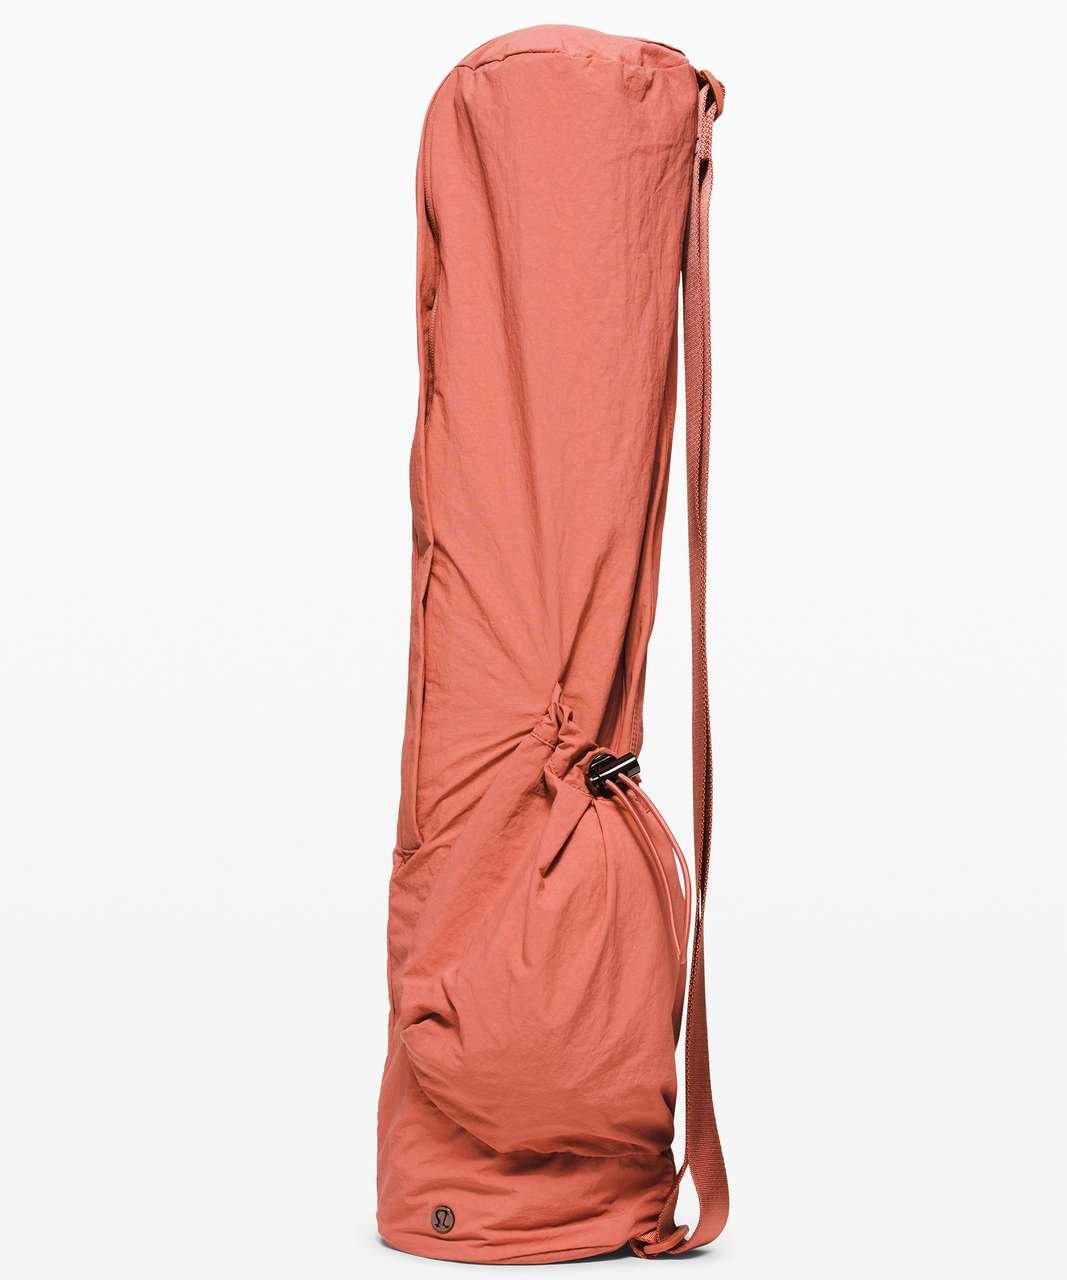 Lululemon The Yoga Mat Bag *16L - Copper Clay